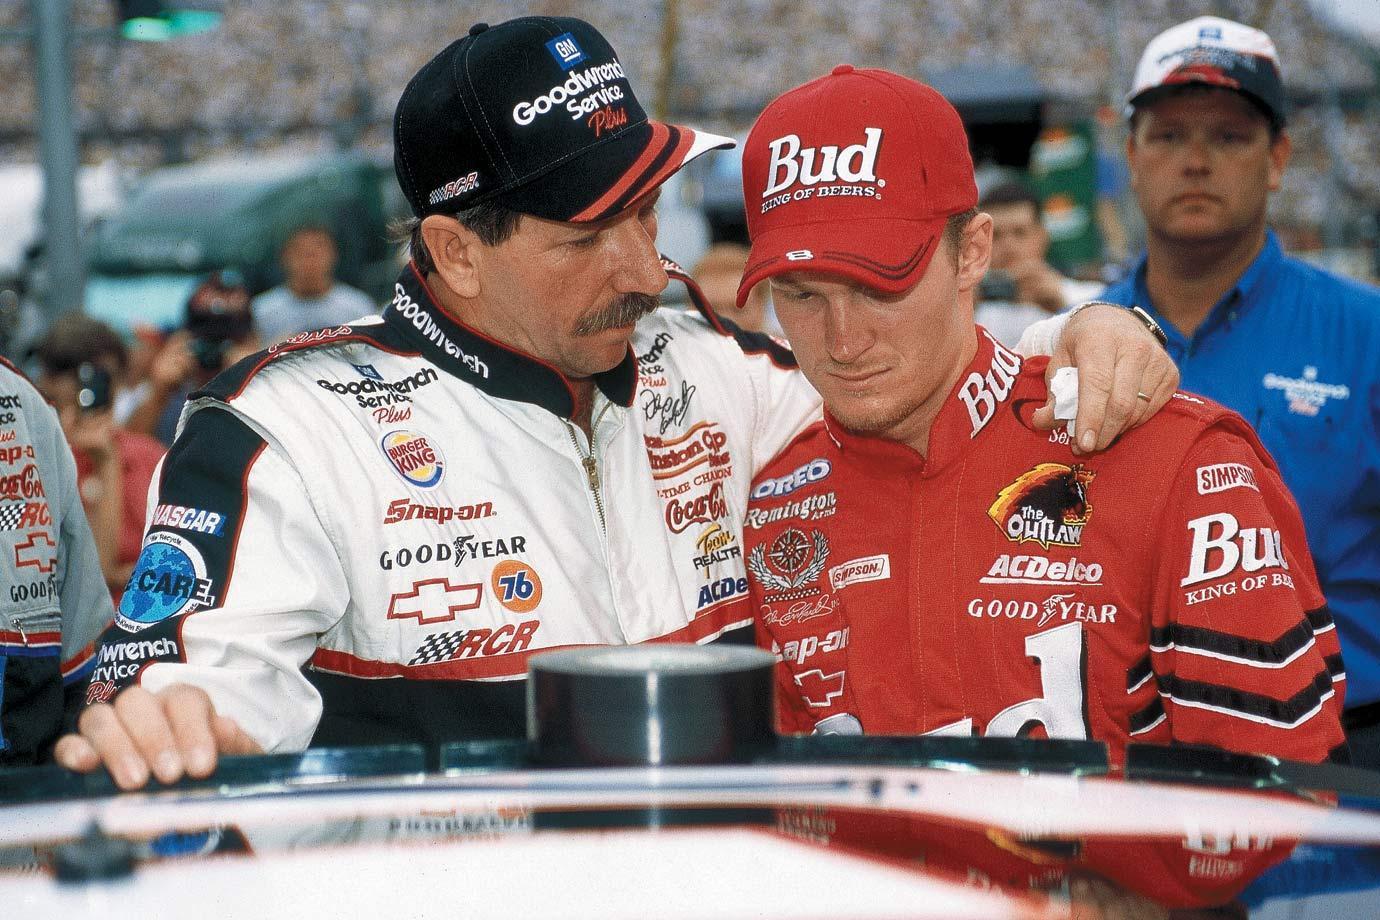 Dale Earnhardt Sr and Jr., via ecelebrityfacts.com